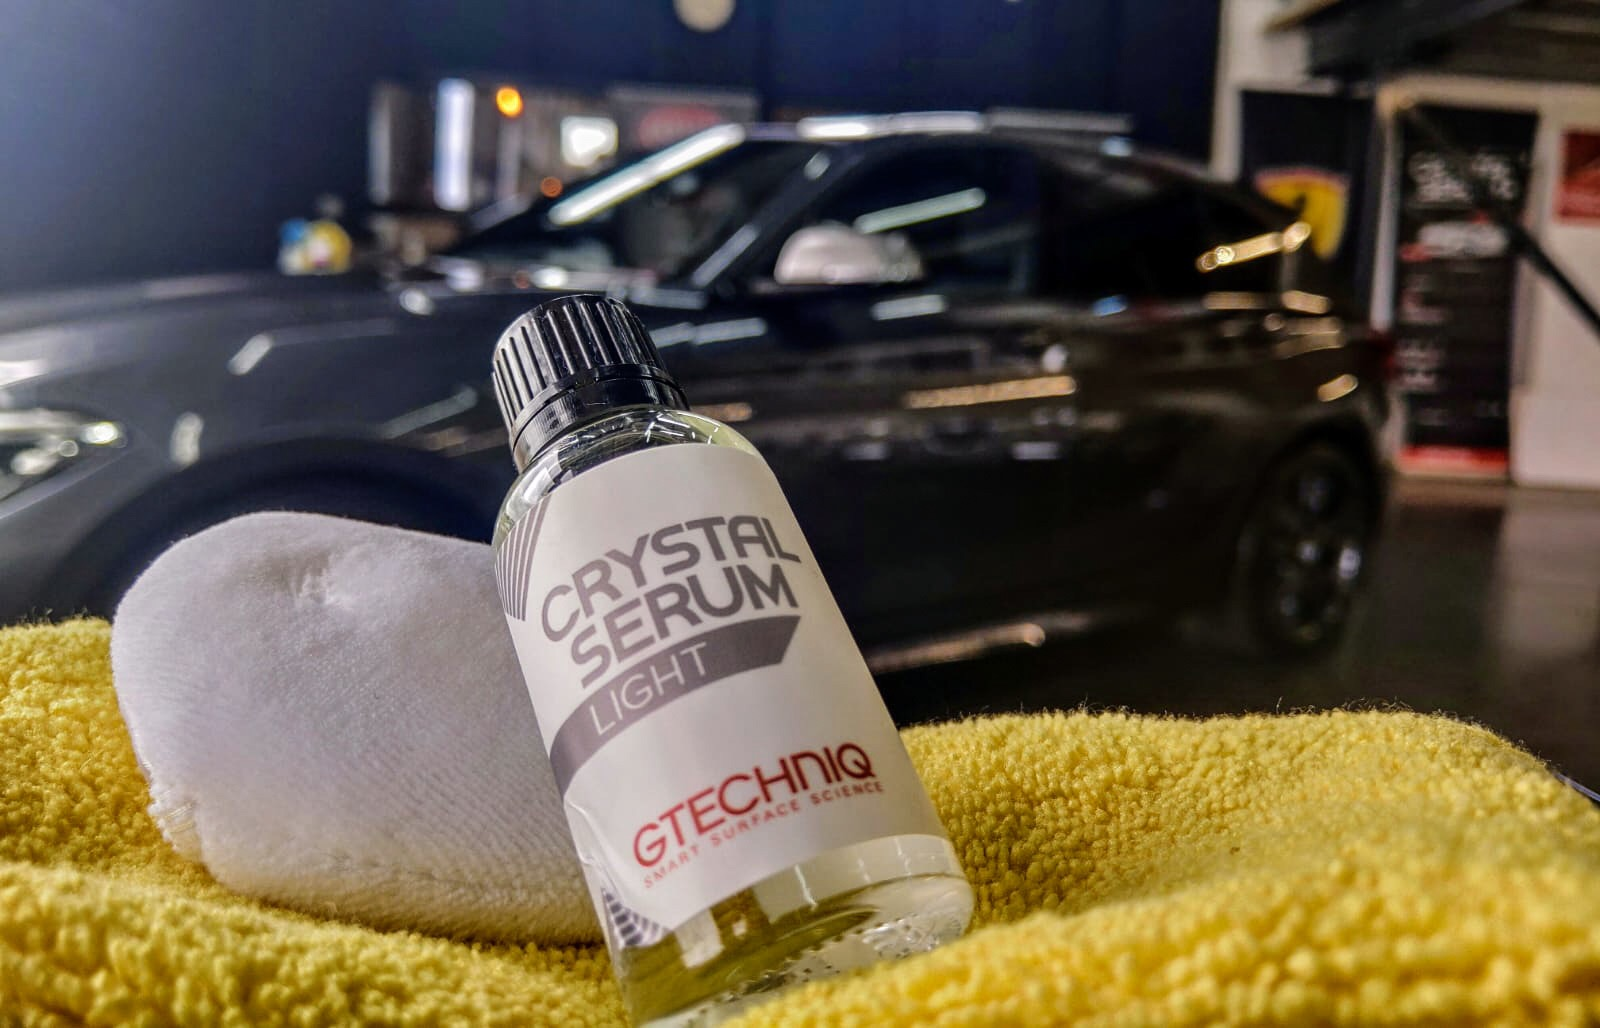 What is Gtechniq Crystal Serum Light